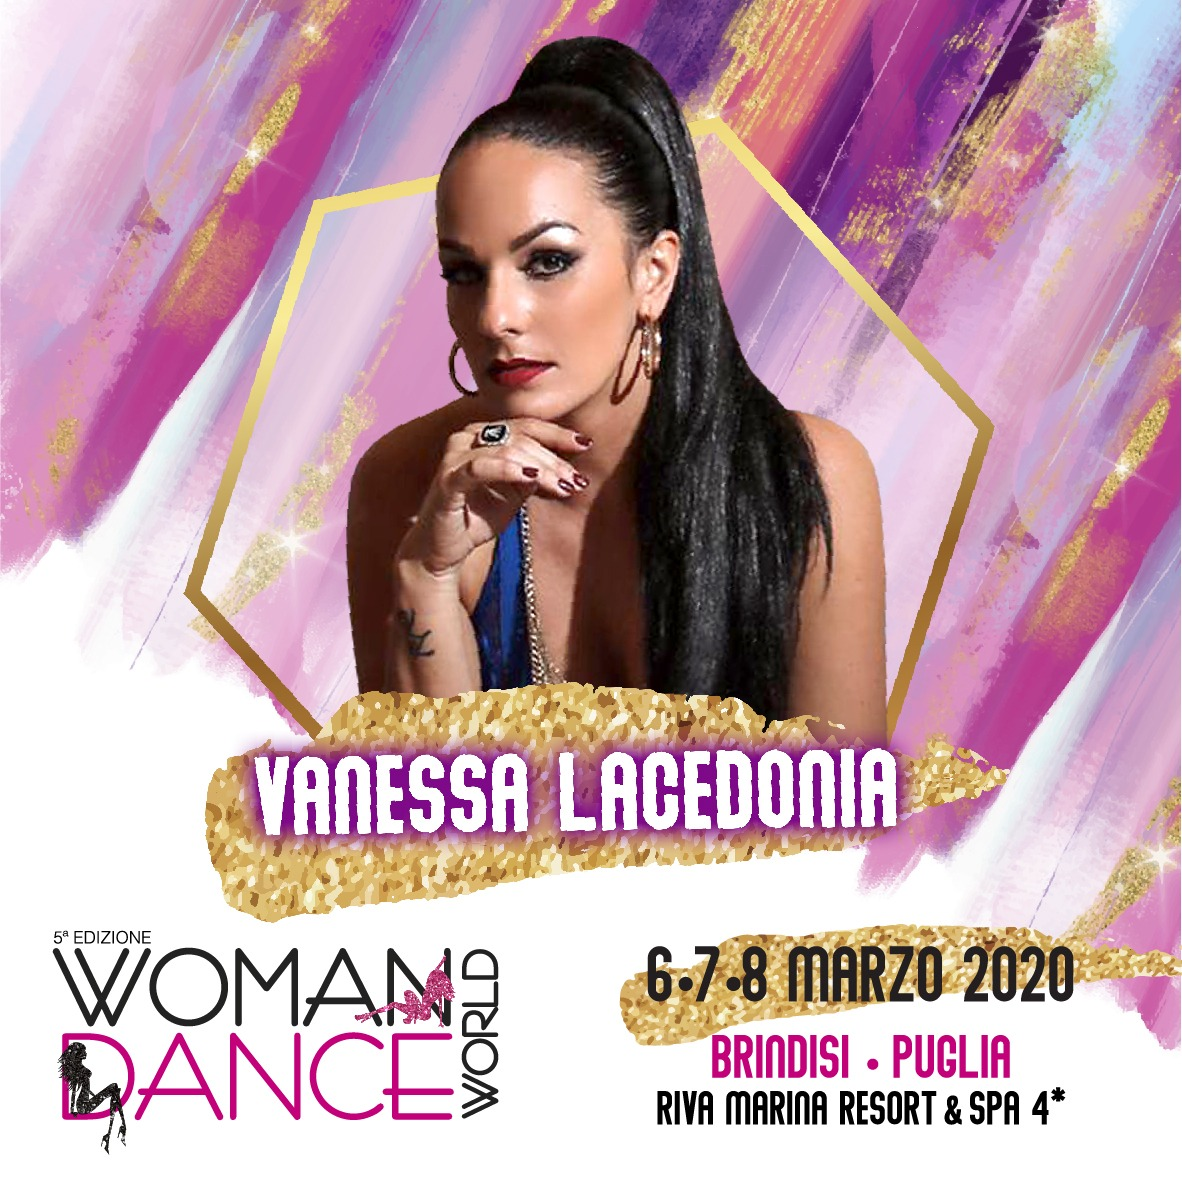 Vanessa Lacedonia